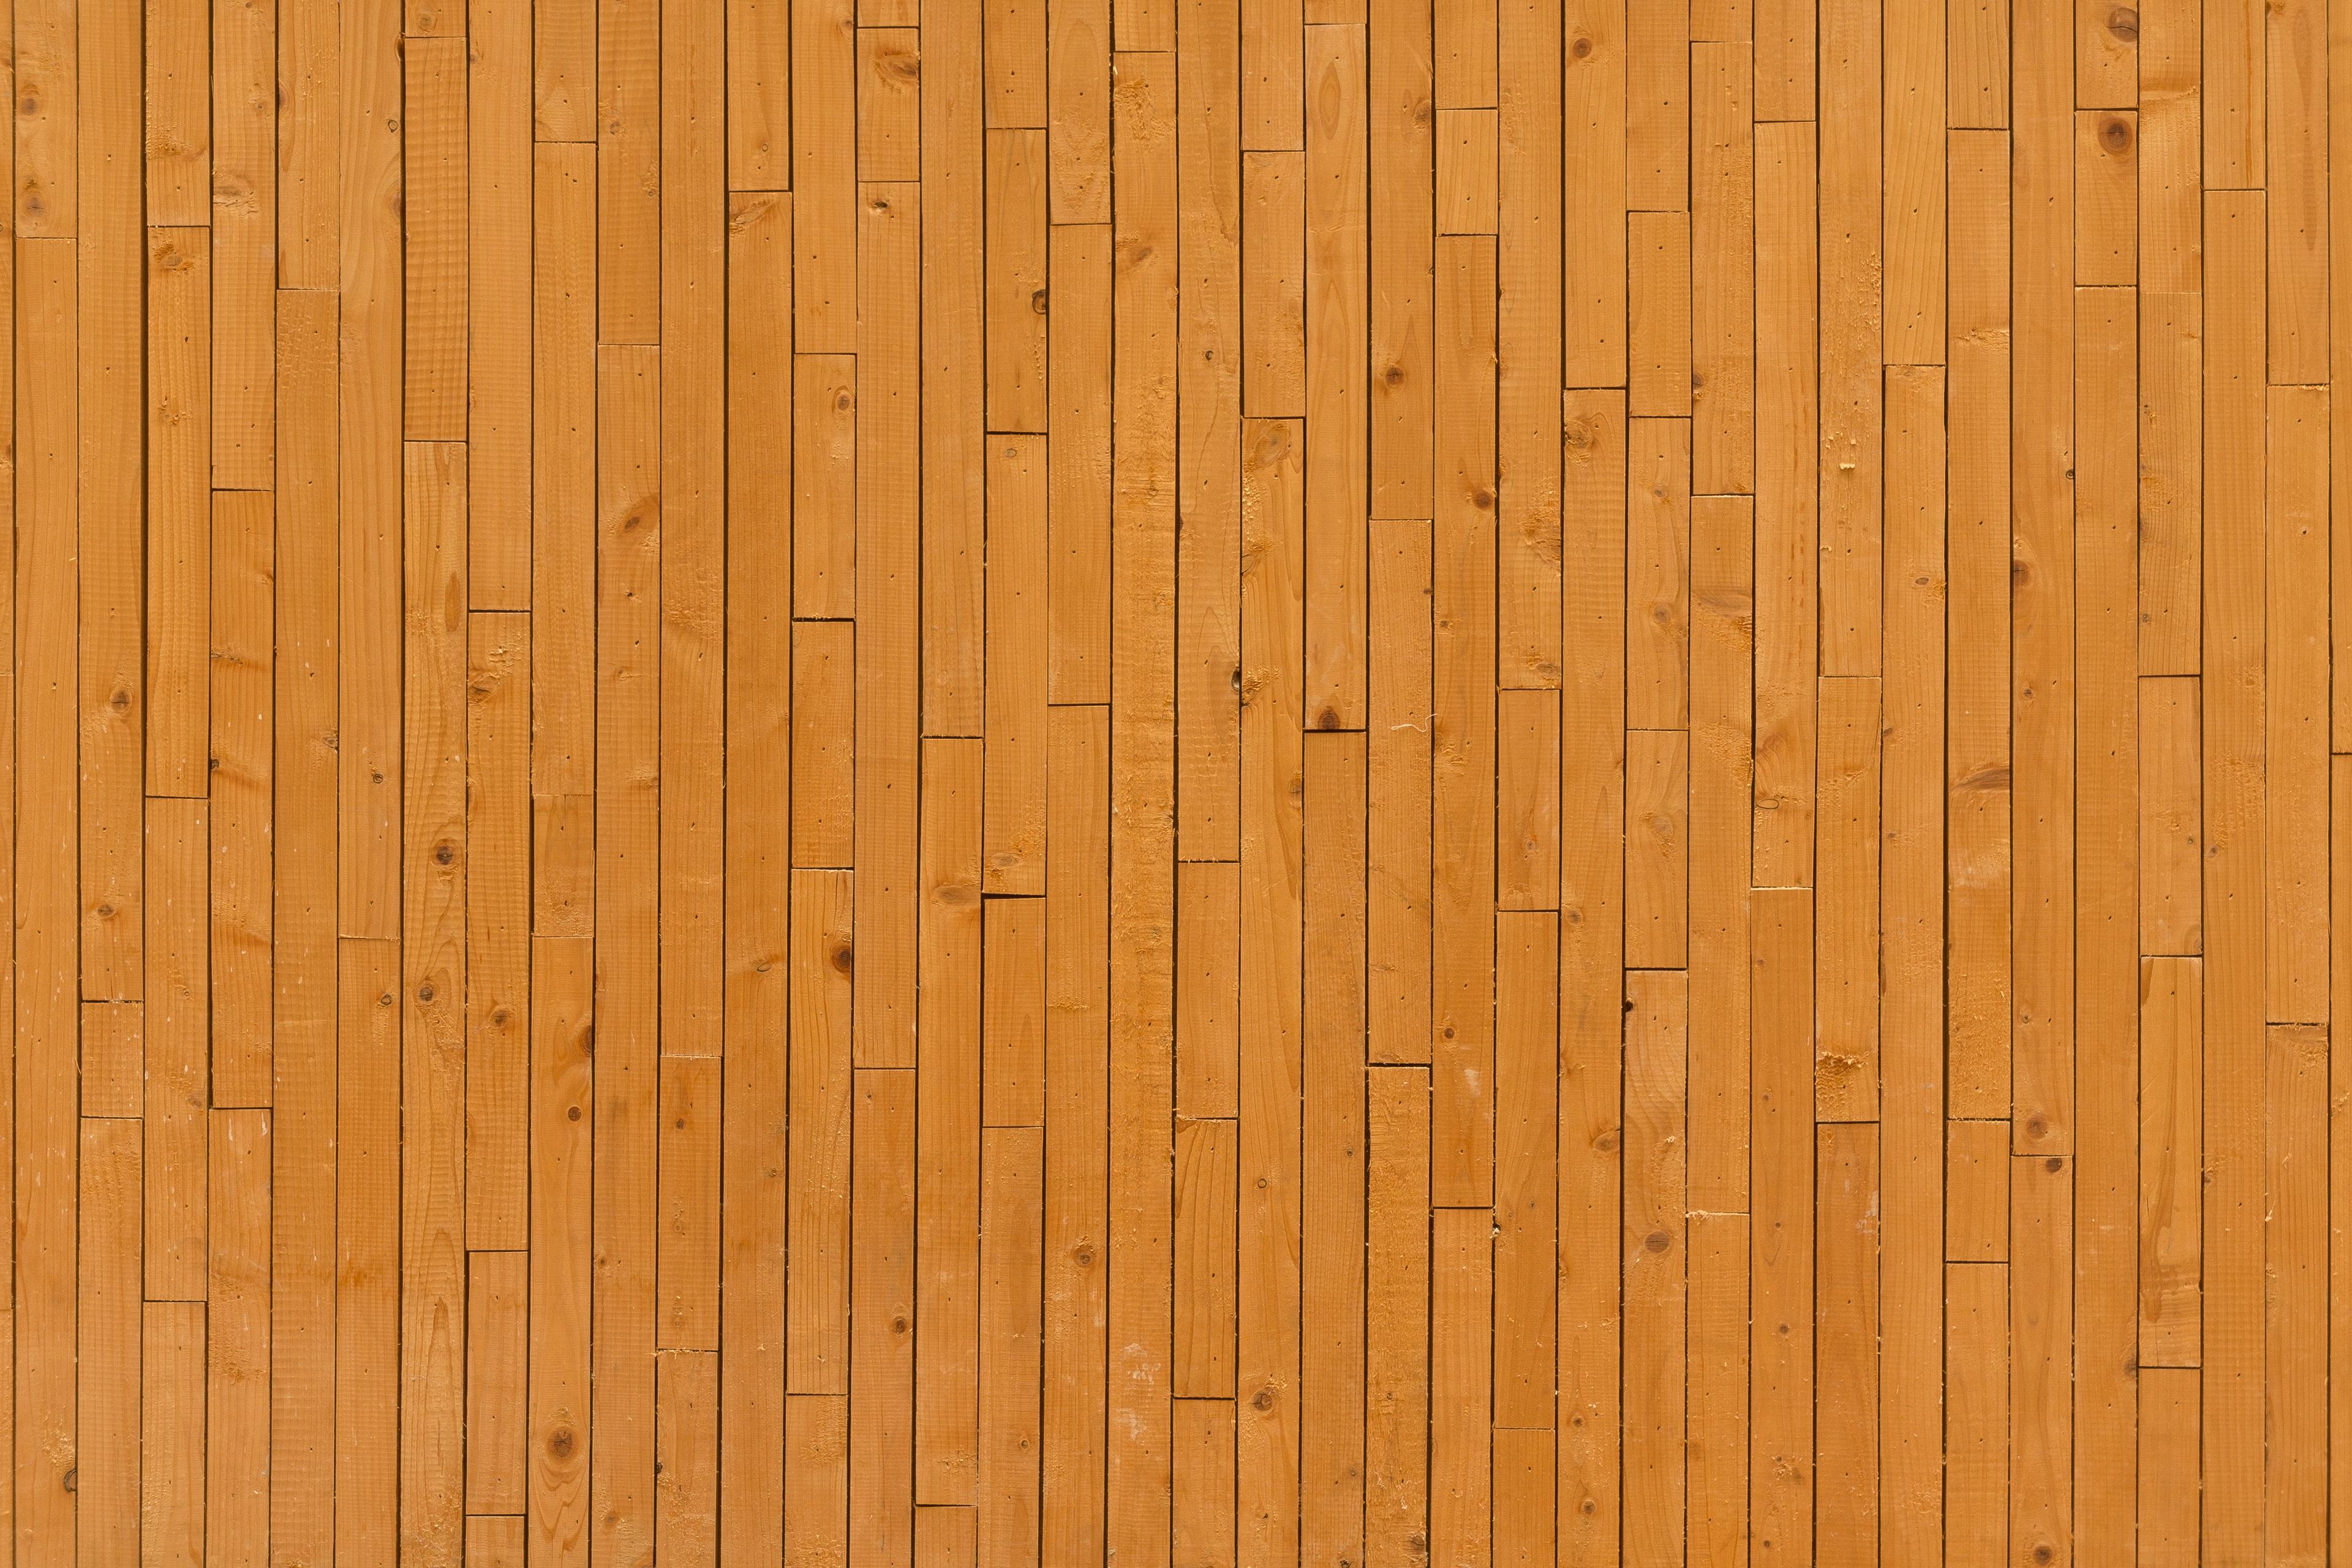 Free images texture plank floor interior wall wild - Aislantes termicos para paredes interiores ...